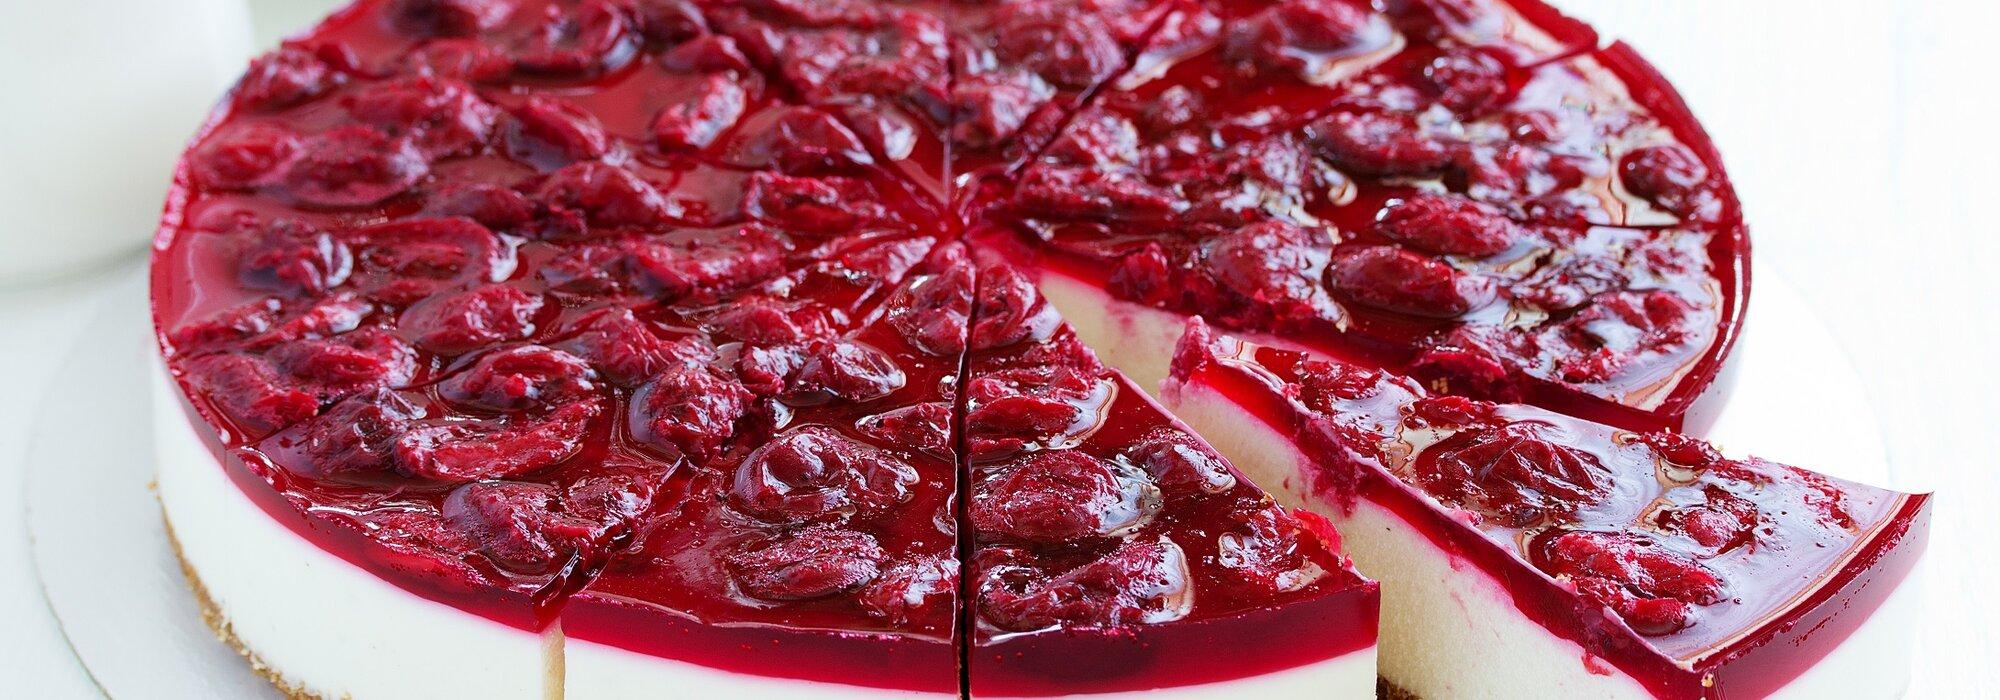 Koolhydraatbeperkte kersen Monchou taart